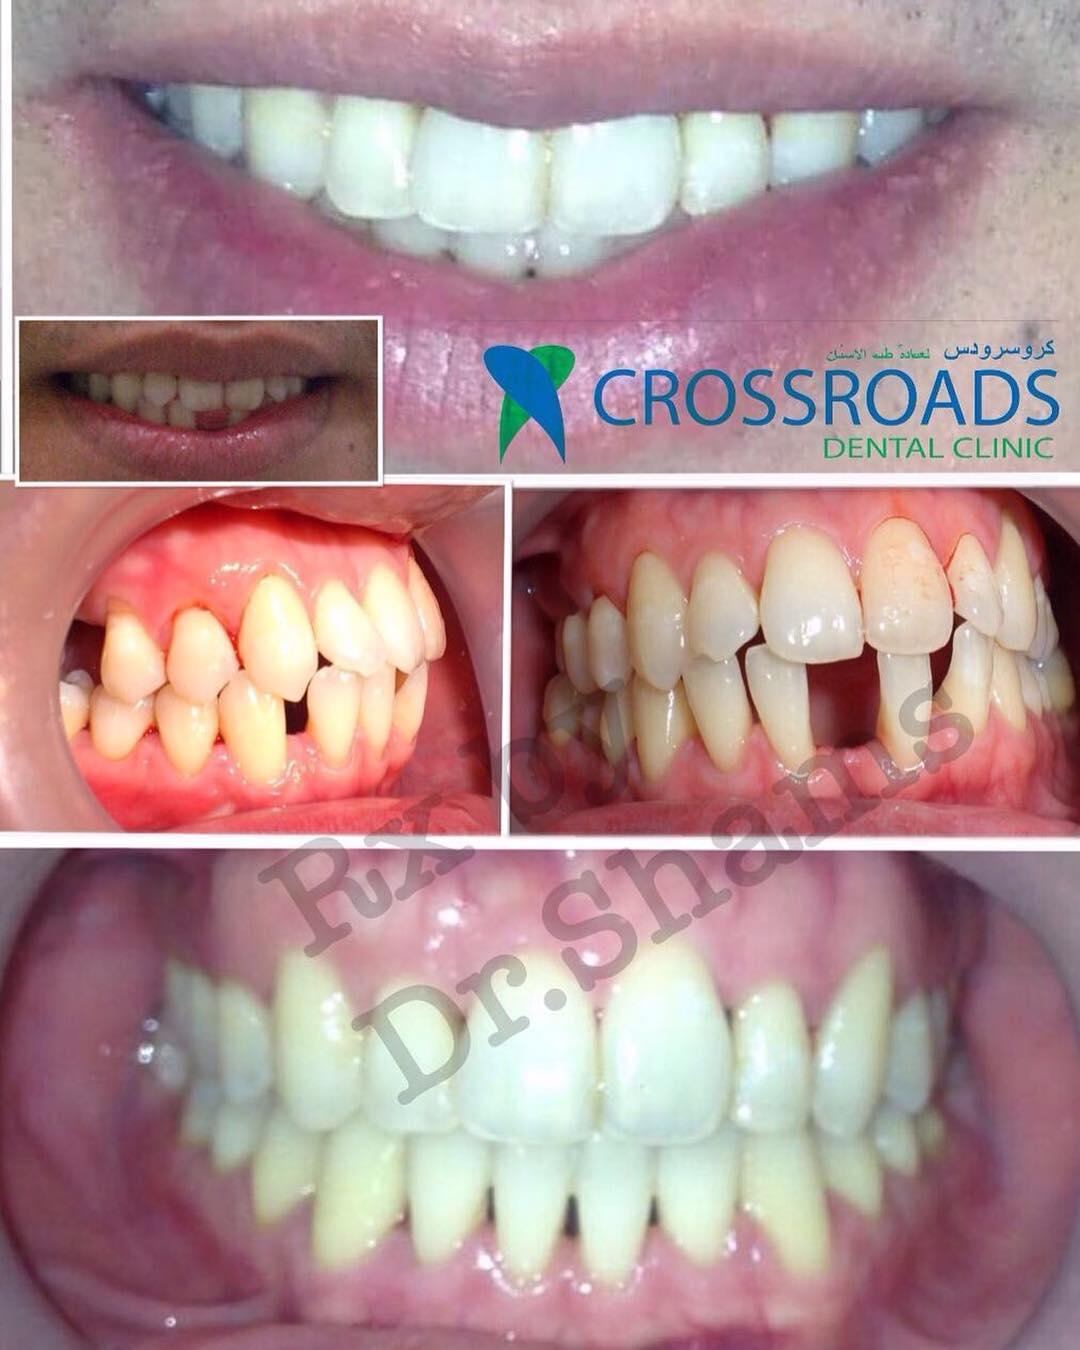 Crossroads Dental Clinic